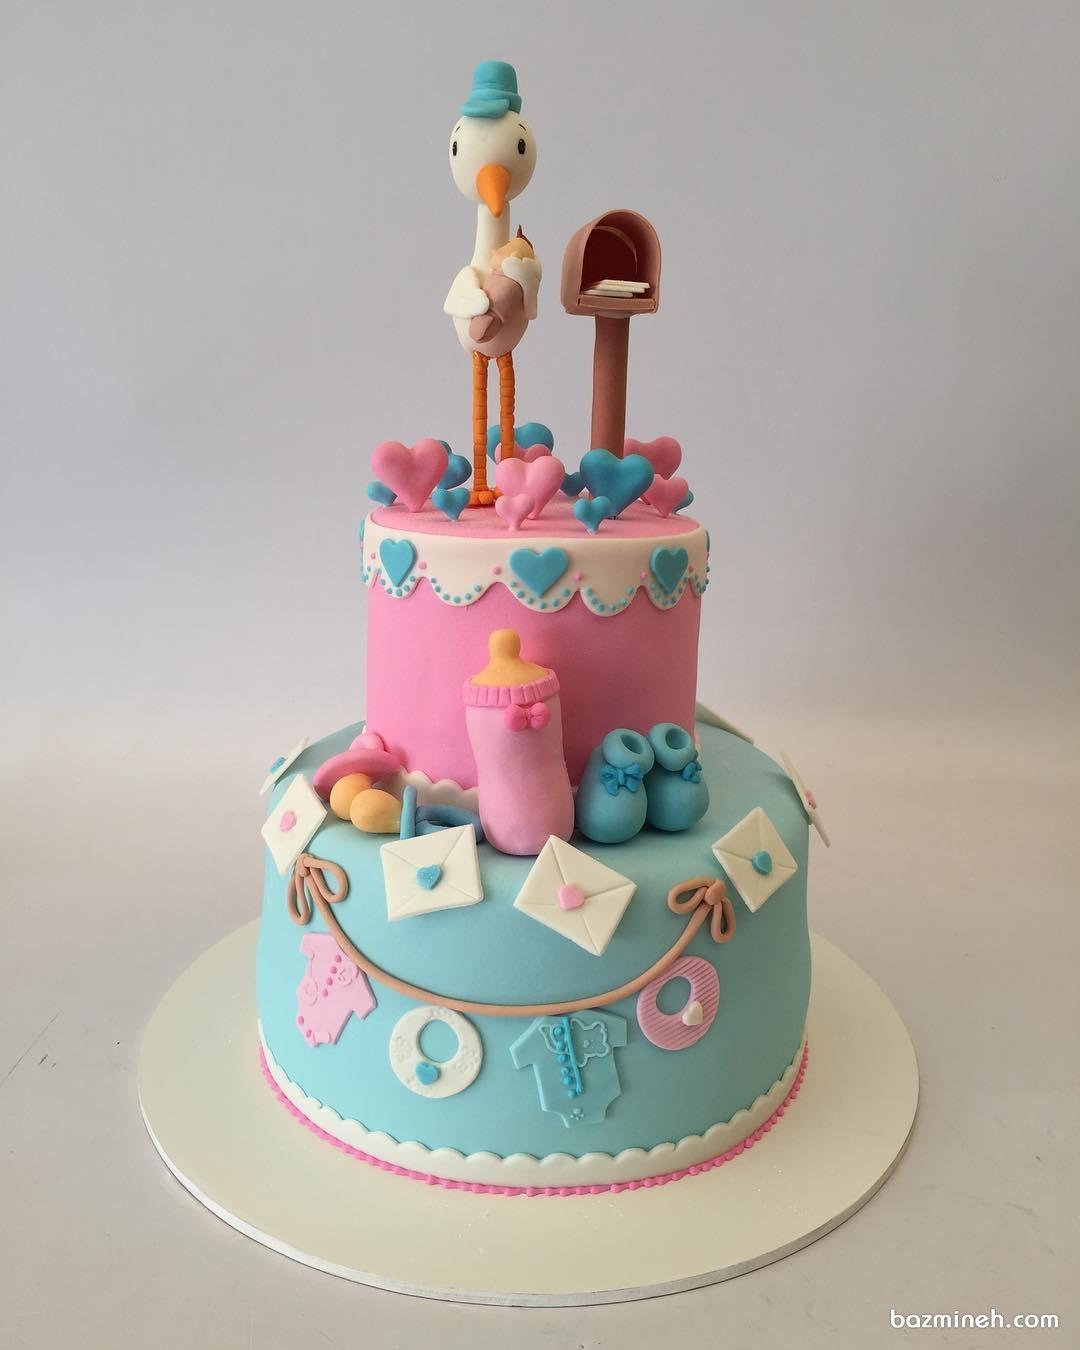 کیک بامزه جشن بیبی شاور یا تعیین جنسیت با تم لک لک